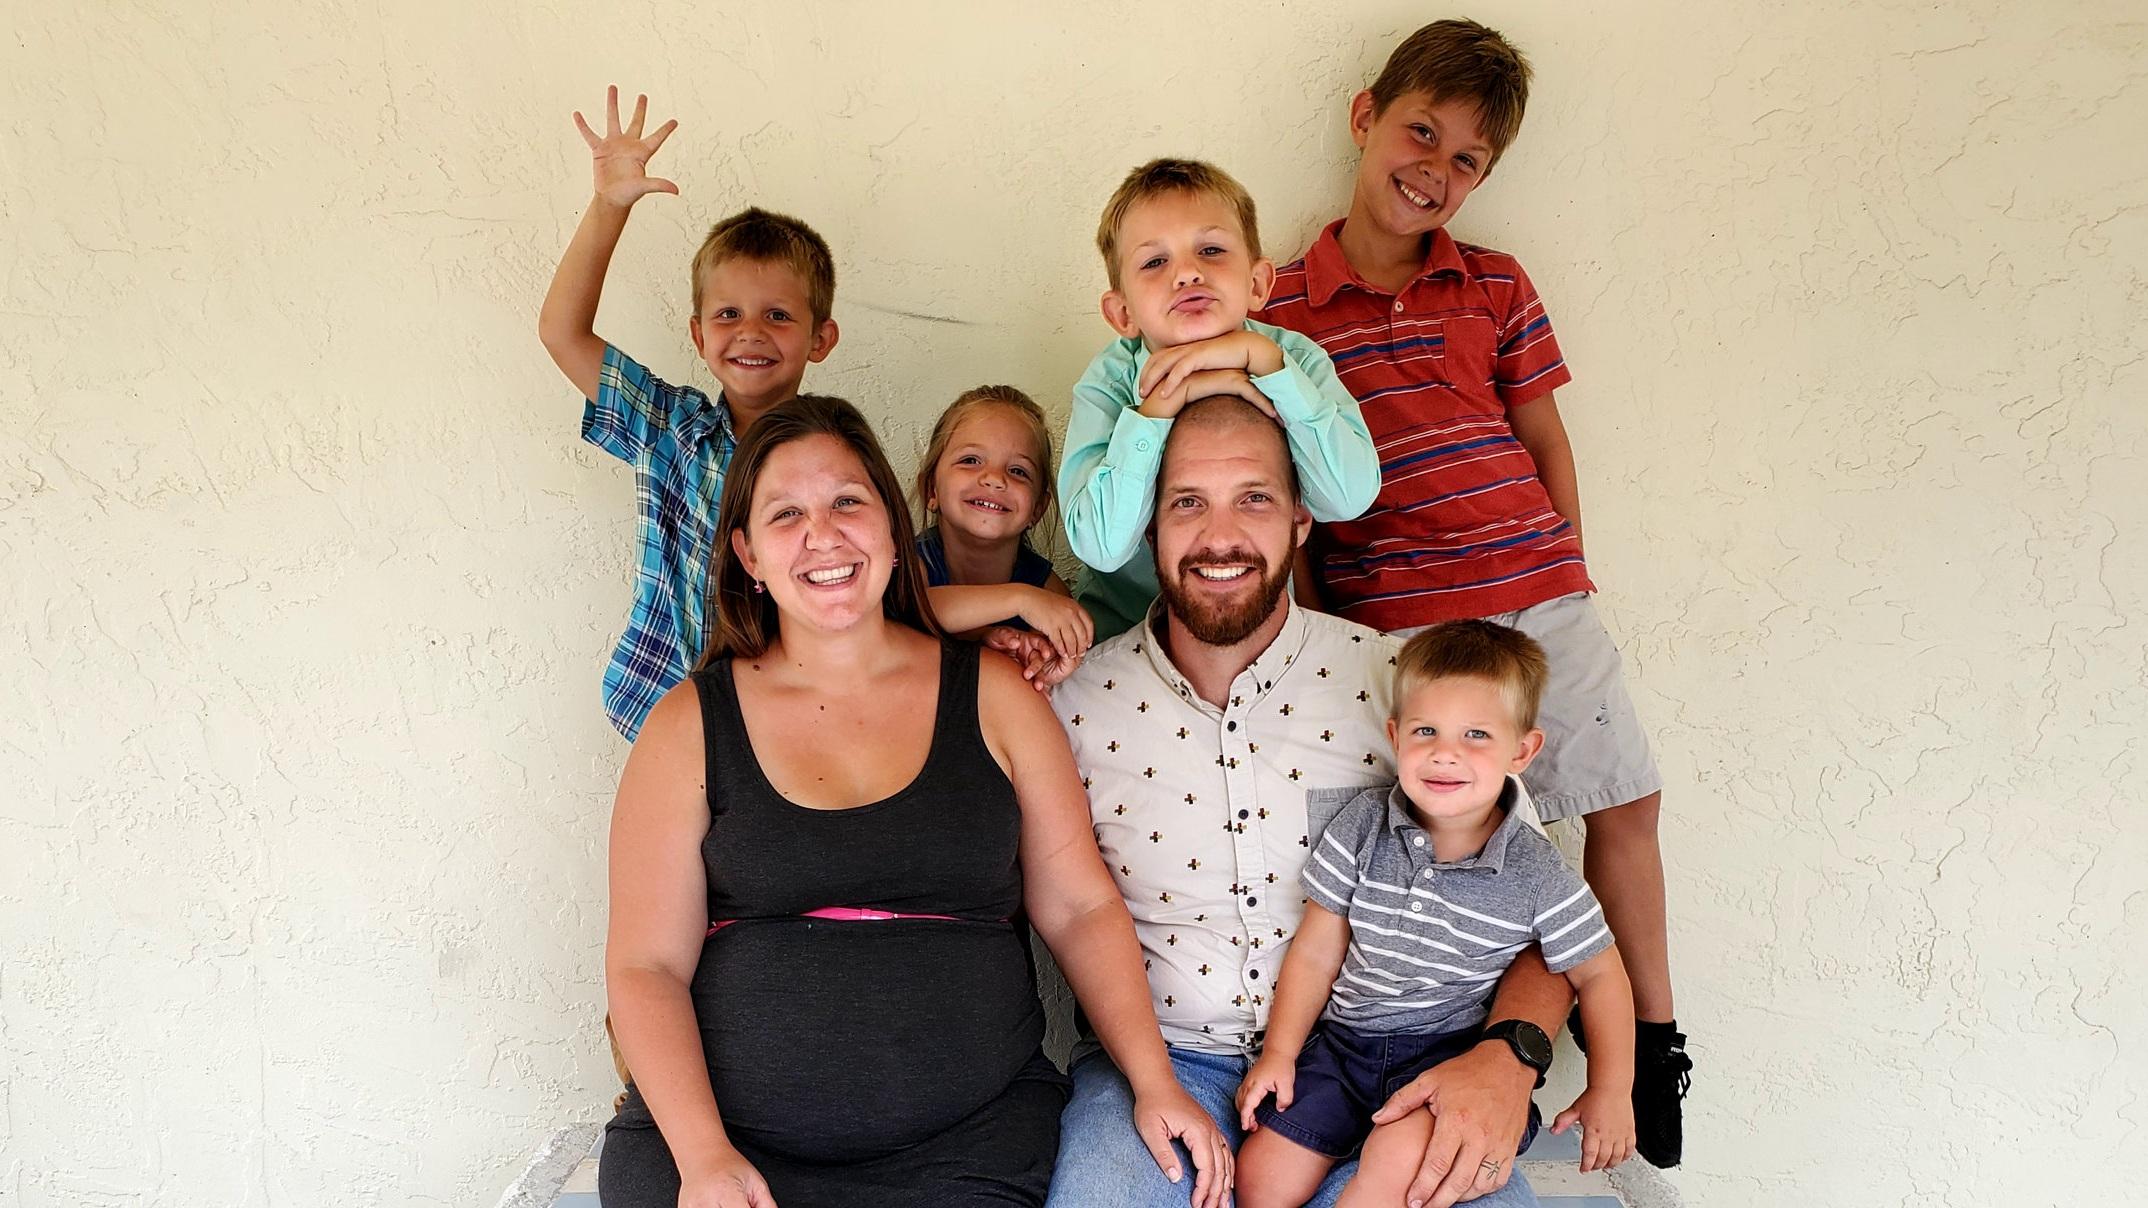 Lockstampfor Family